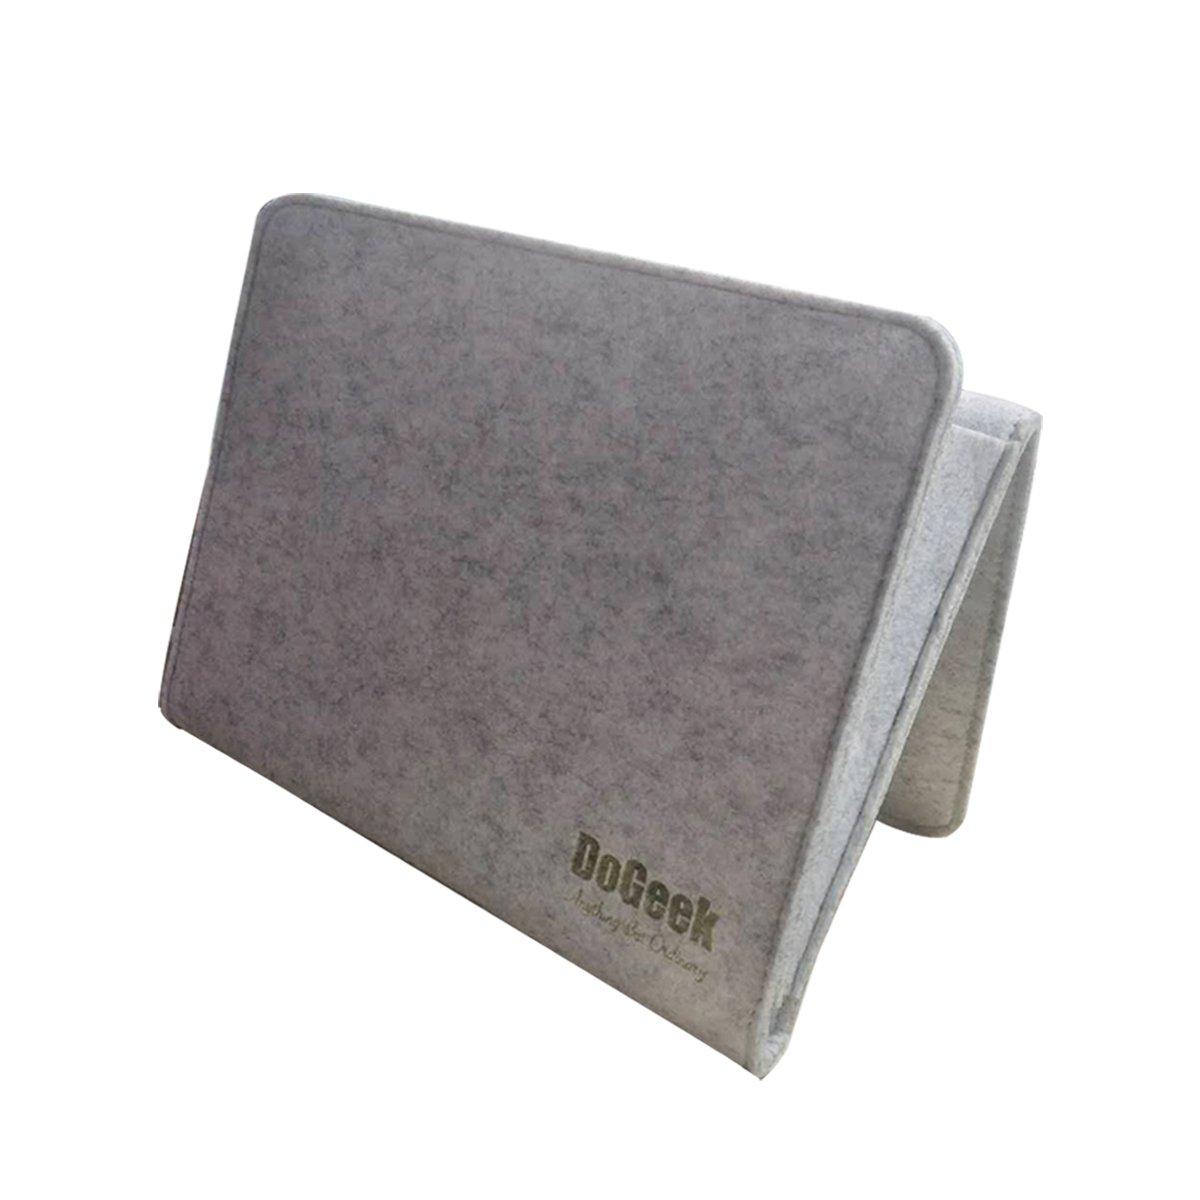 DoGeek Bedside Storage Organizer,Bedside Caddy,Sofa Storage Organizer Table Storage Organizer Tablet Magazine Phone iPad Remotes,Grey US-DG-Bedside storage- Grey